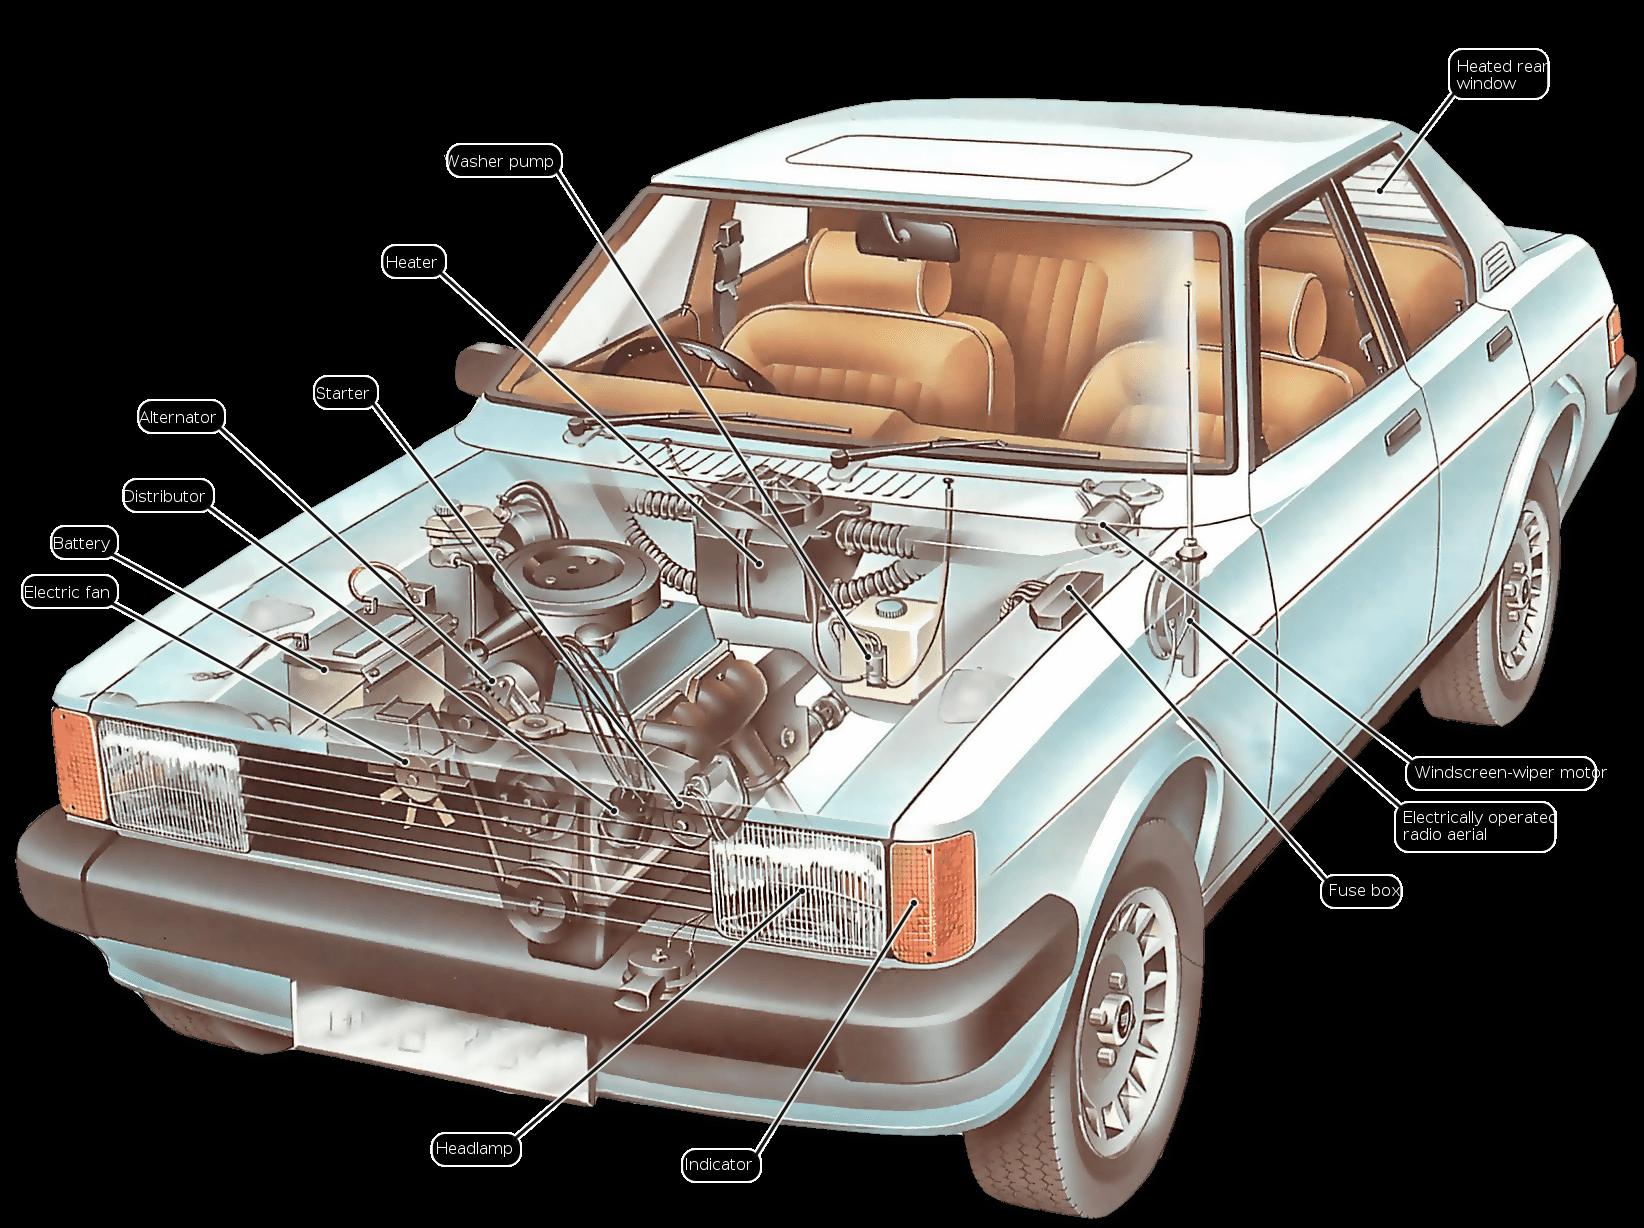 Diagram Wiringdiagram Diagramming Diagramm Visuals Visualisation Graphical Check More At Https Thebron Electrical Wiring Diagram Electrical Wiring Car